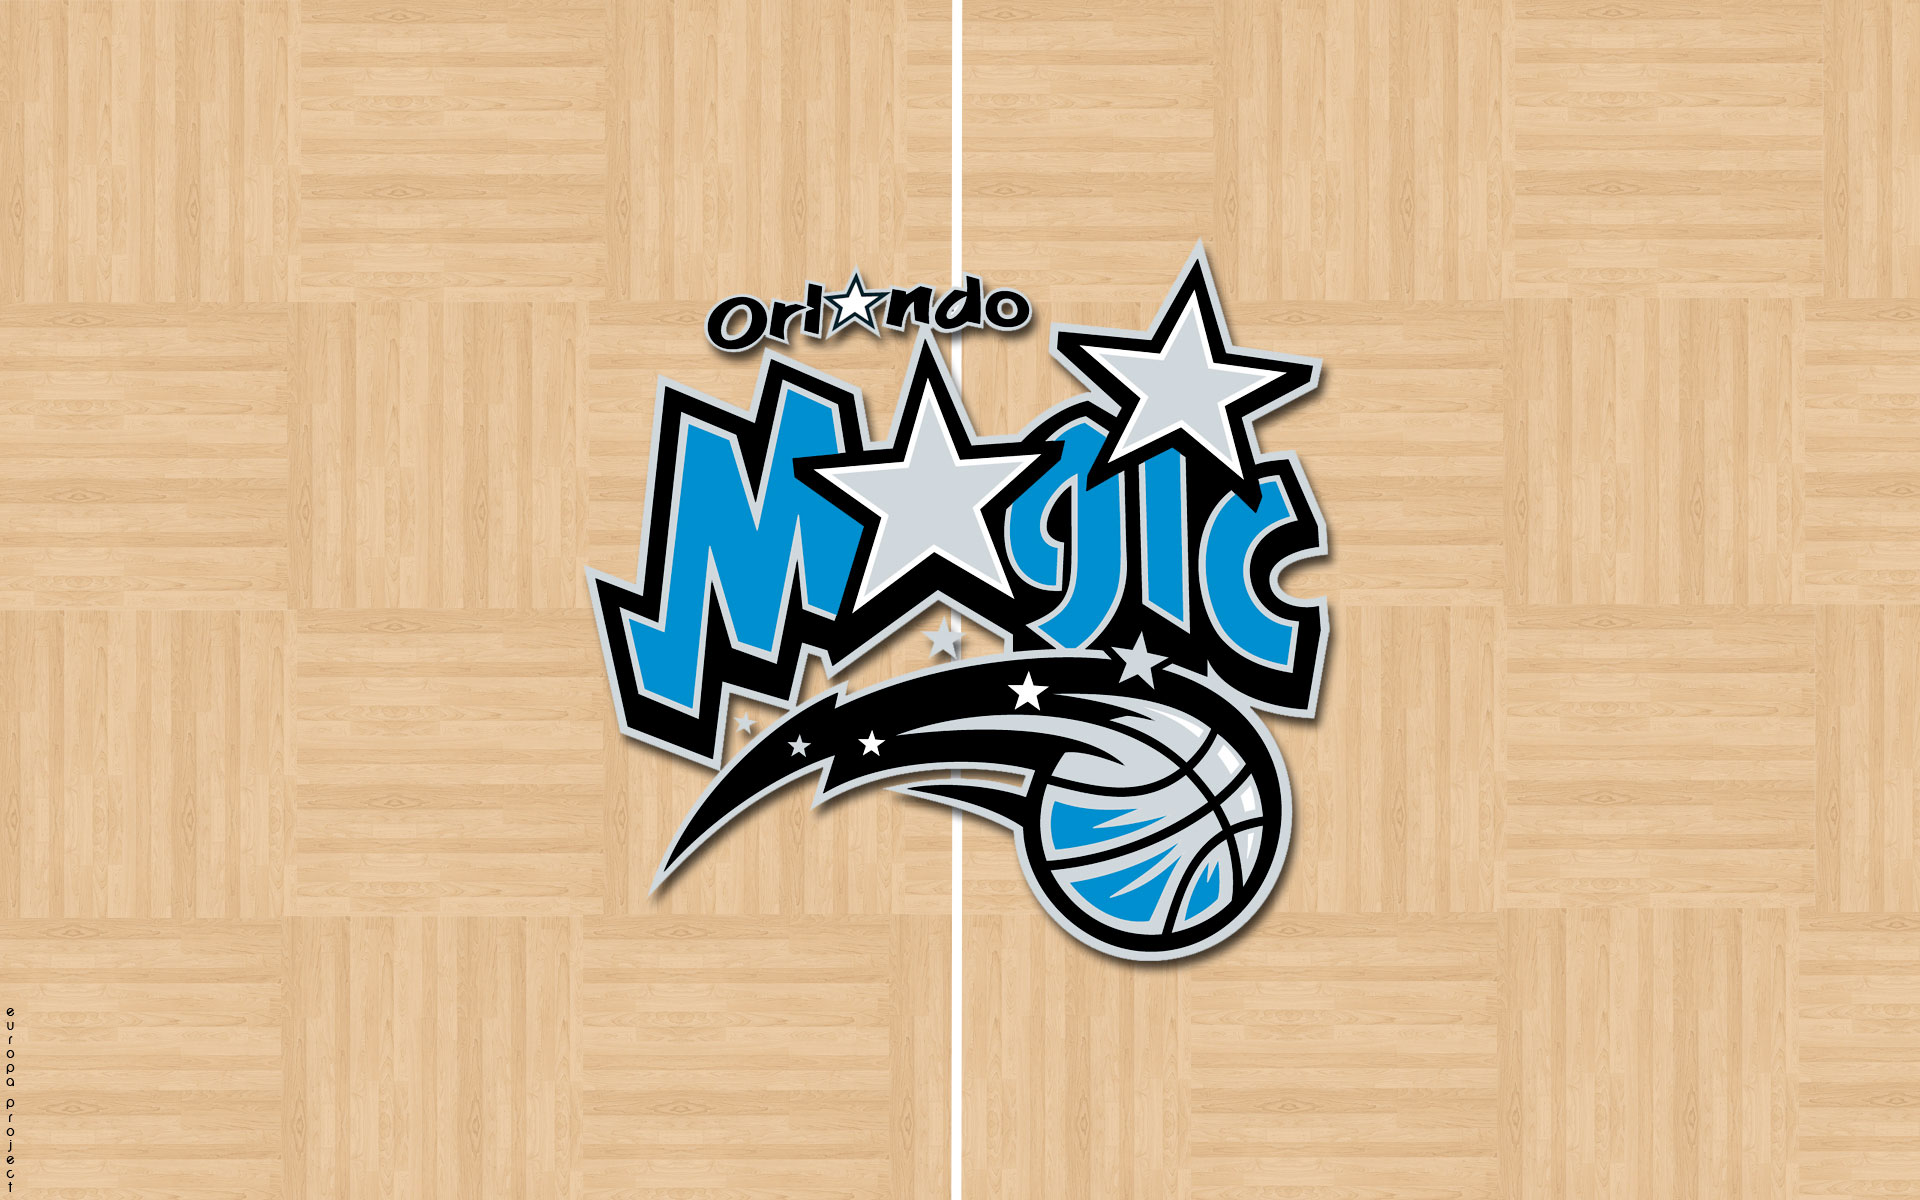 Orlando Magic Wallpaper 1920x1200